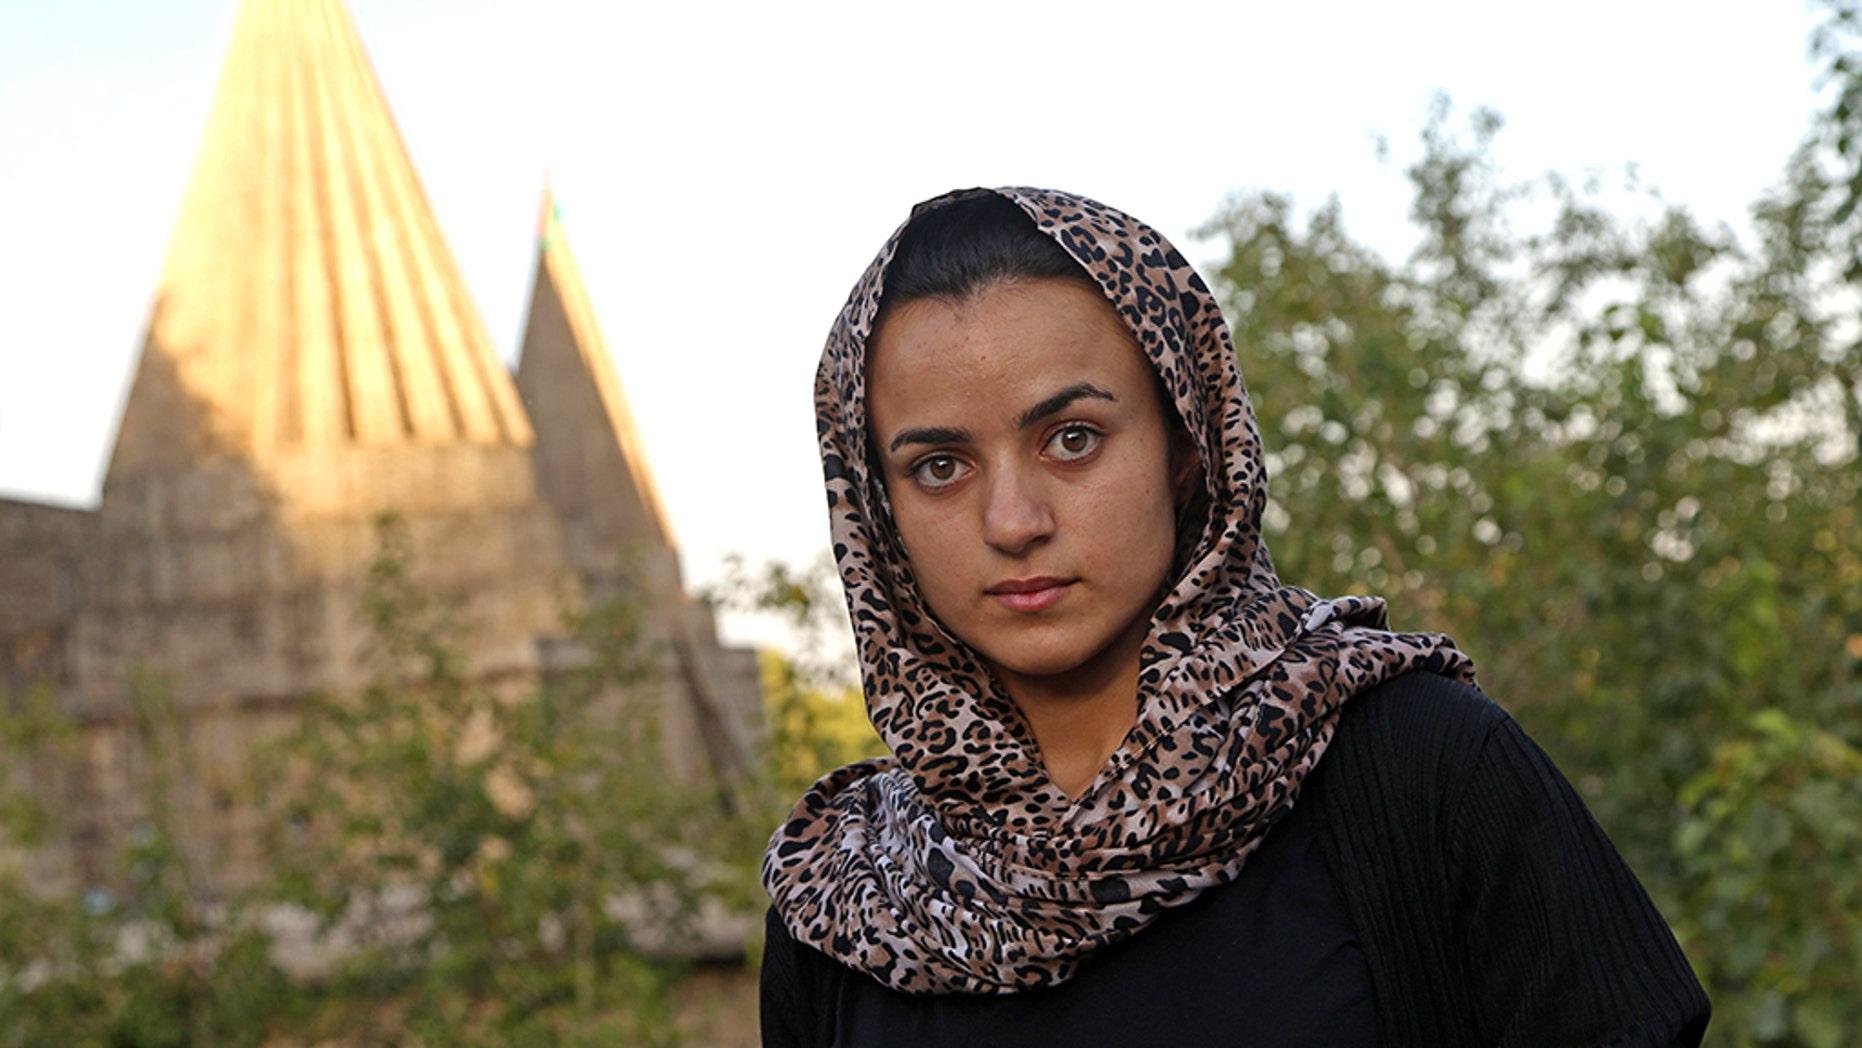 Yazidi woman Ashwaq Haji, allegedly used by the Islamic State group (IS) as